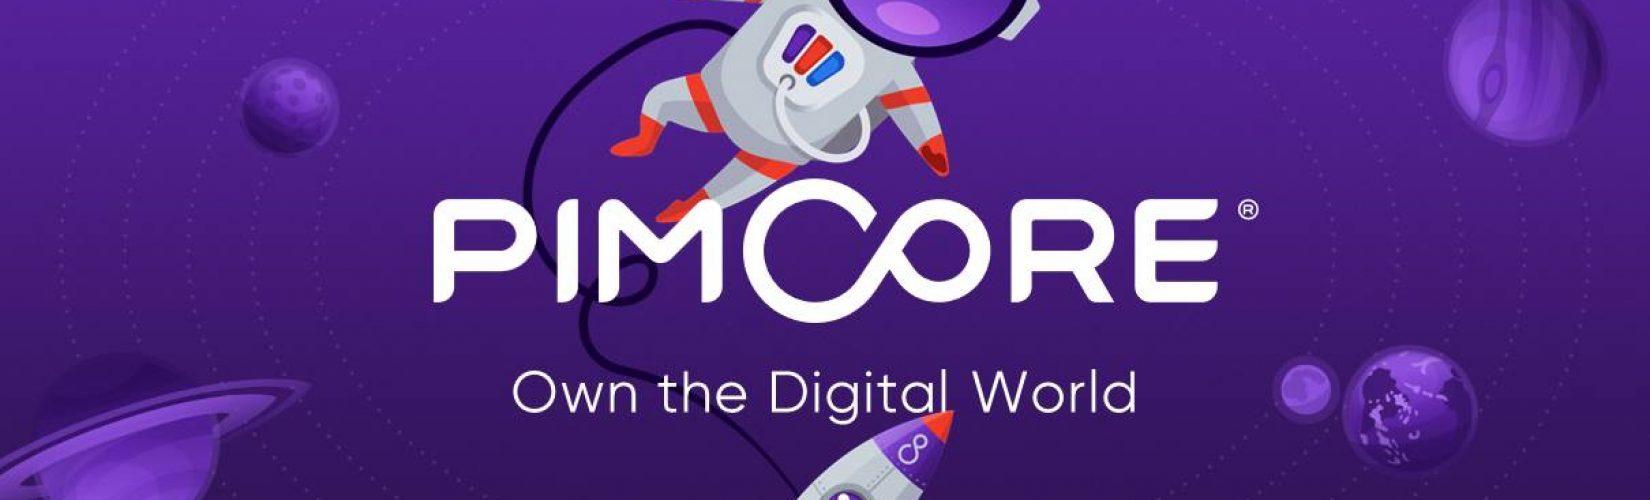 pimcore-digital